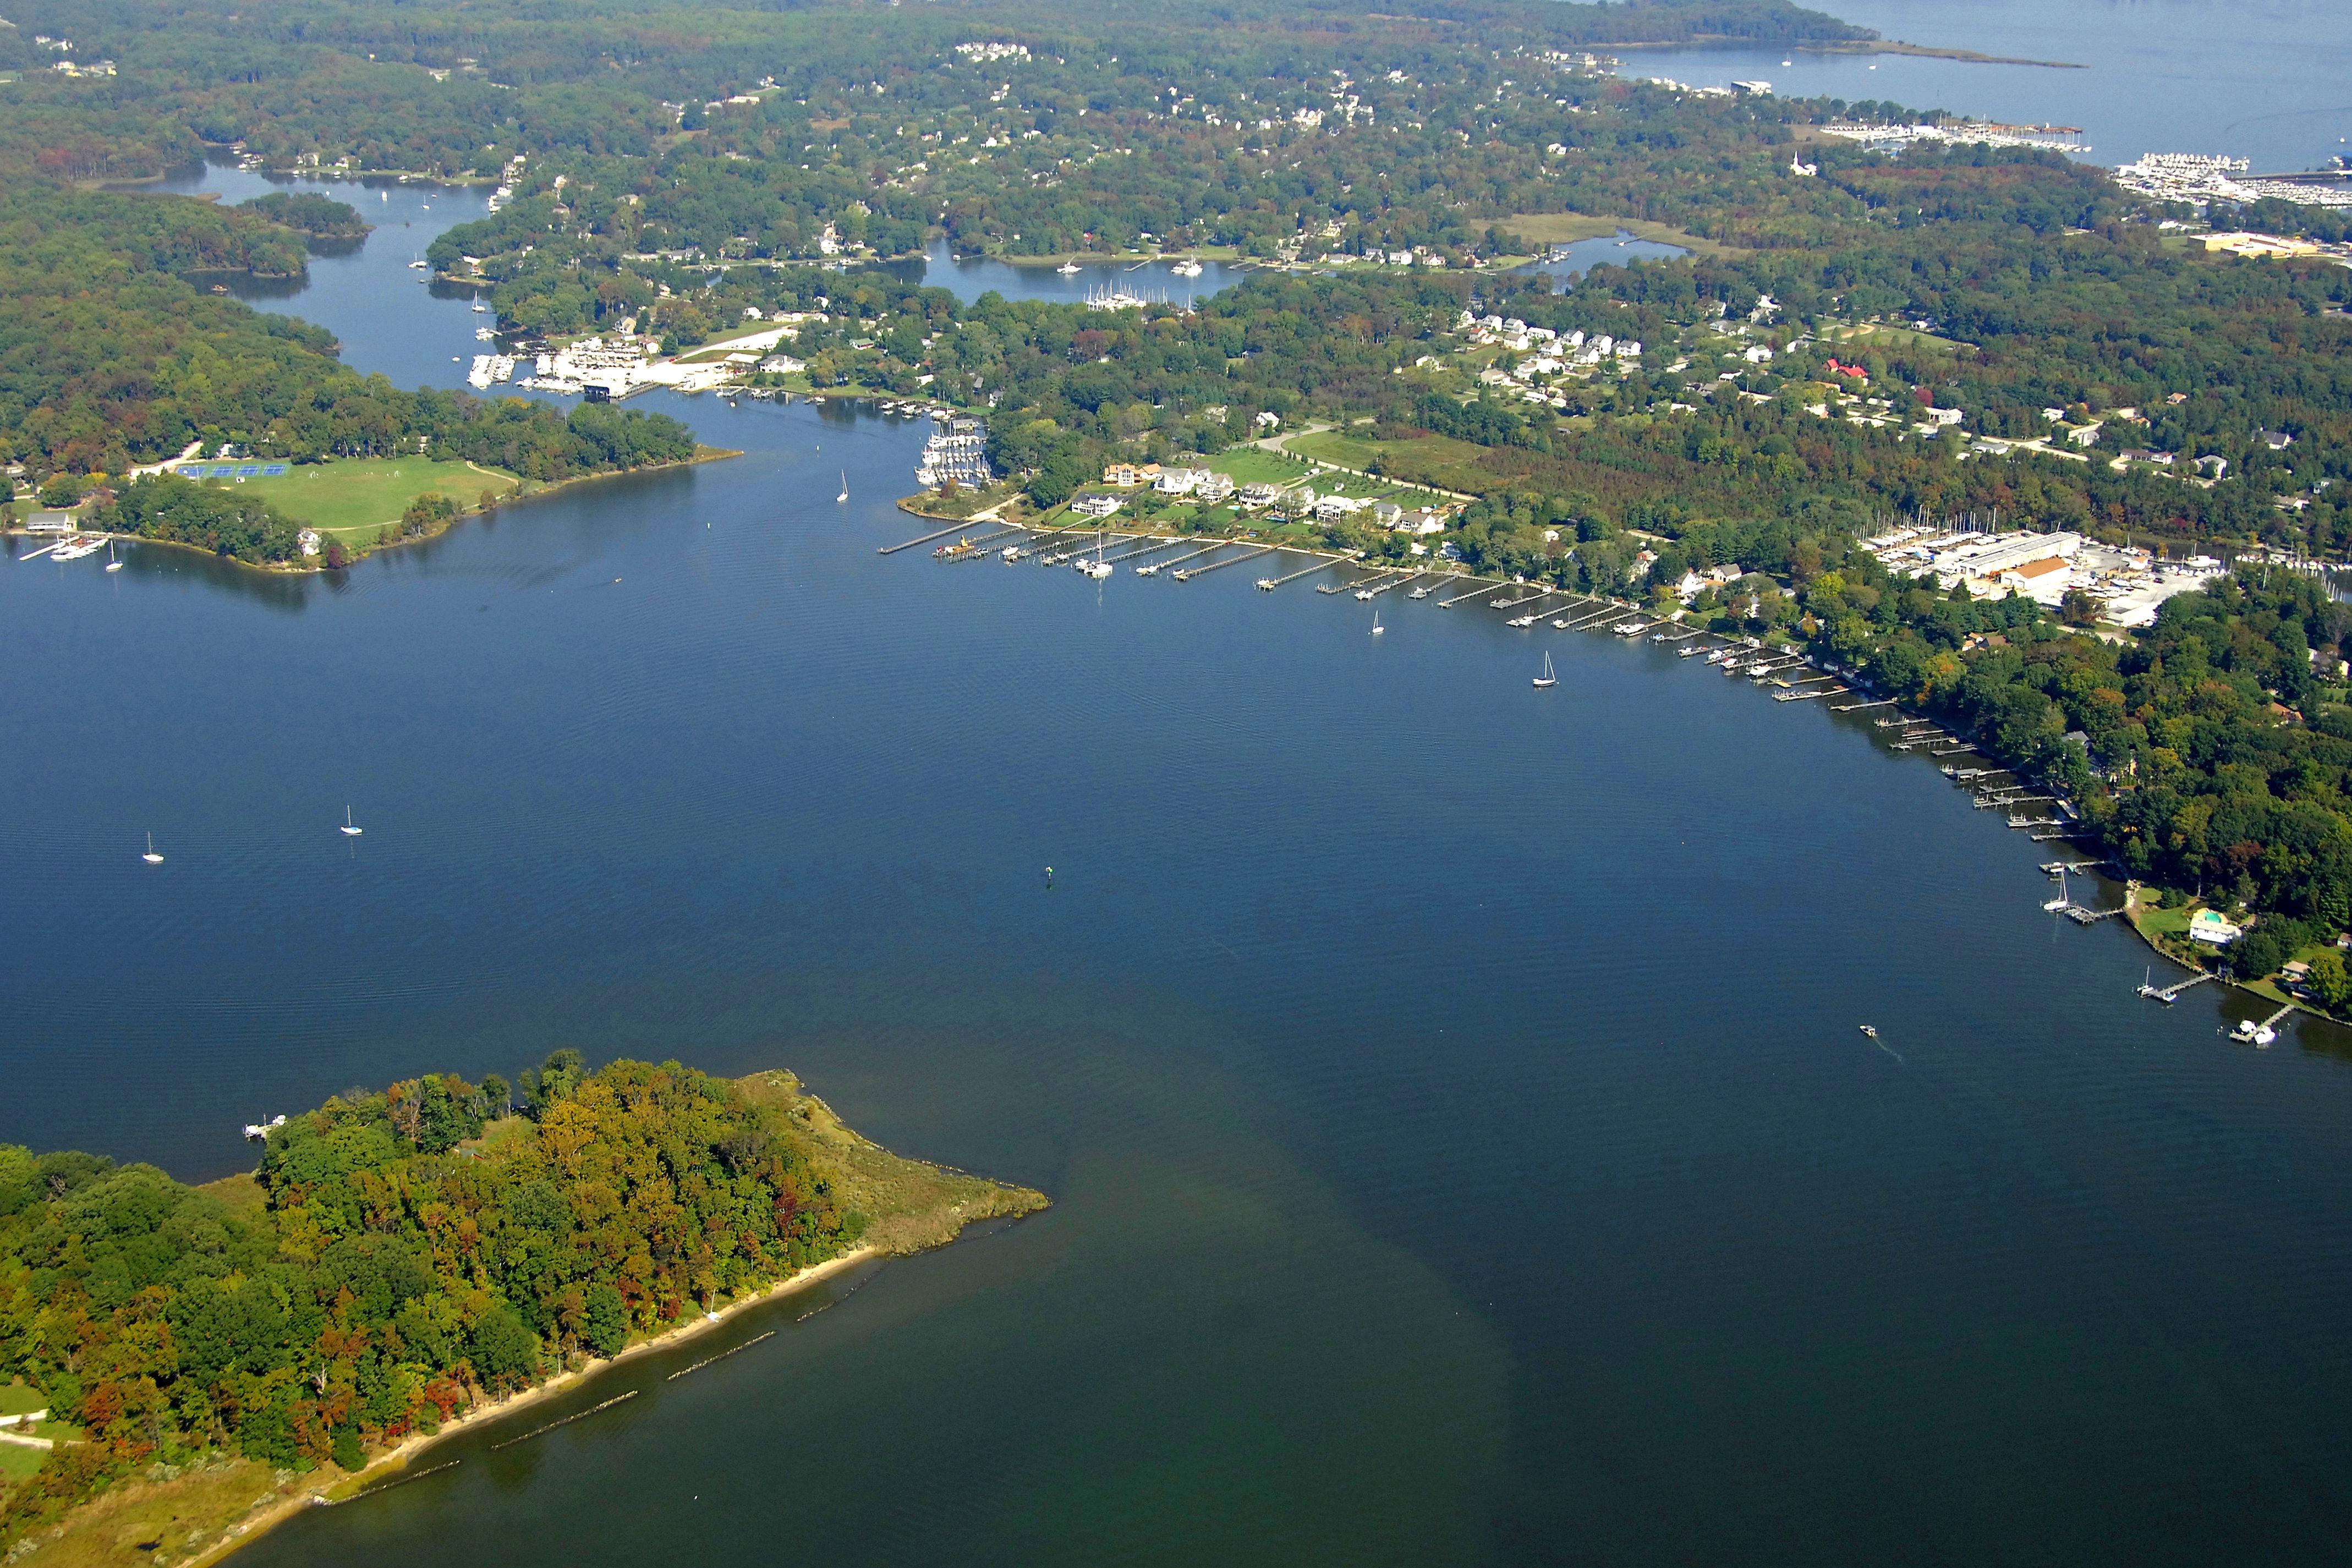 rhode river harbor in cloverlea md united states harbor